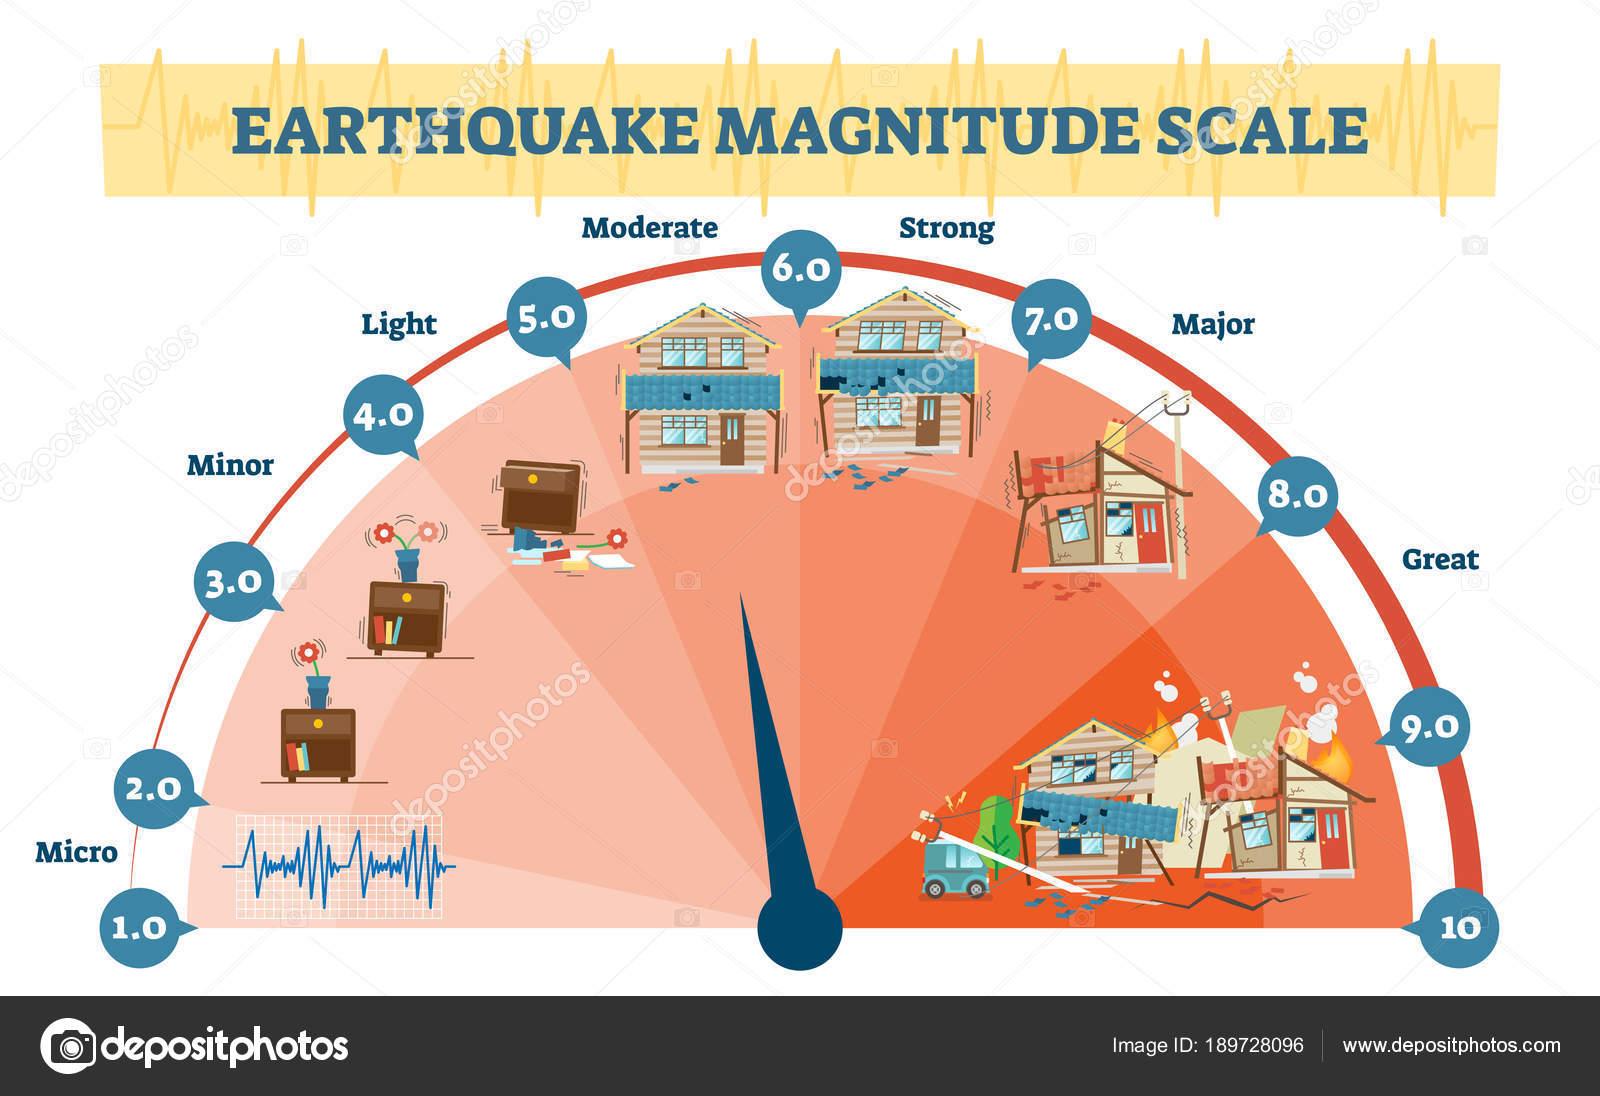 depositphotos_189728096 stock illustration earthquake magnitude levels vector illustration earthquake magnitude levels vector illustration diagram, richter